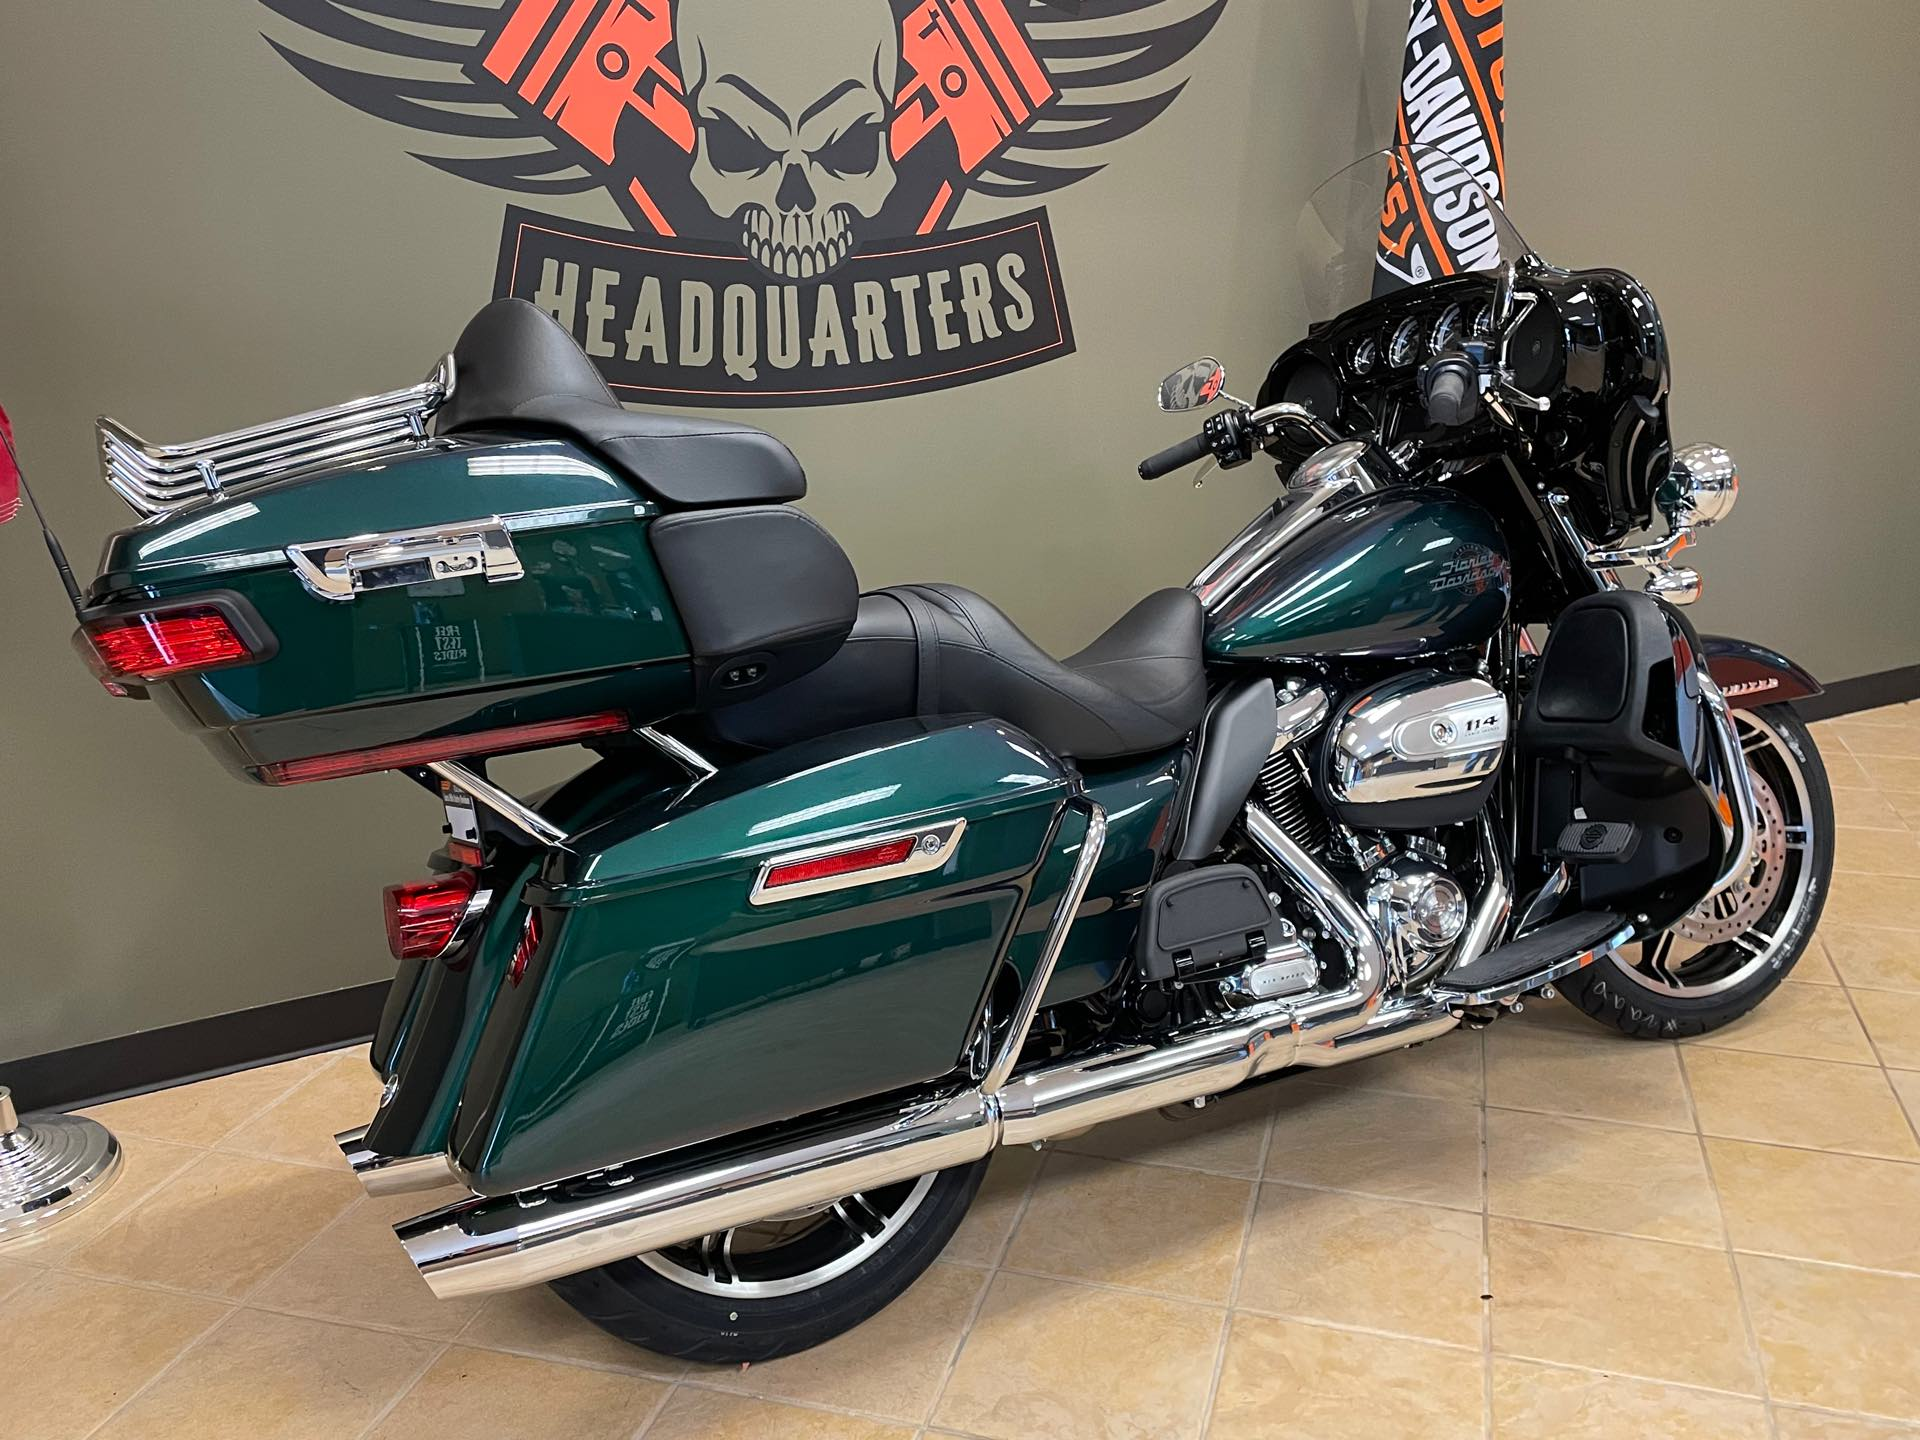 2021 Harley-Davidson Grand American Touring Ultra Limited at Loess Hills Harley-Davidson